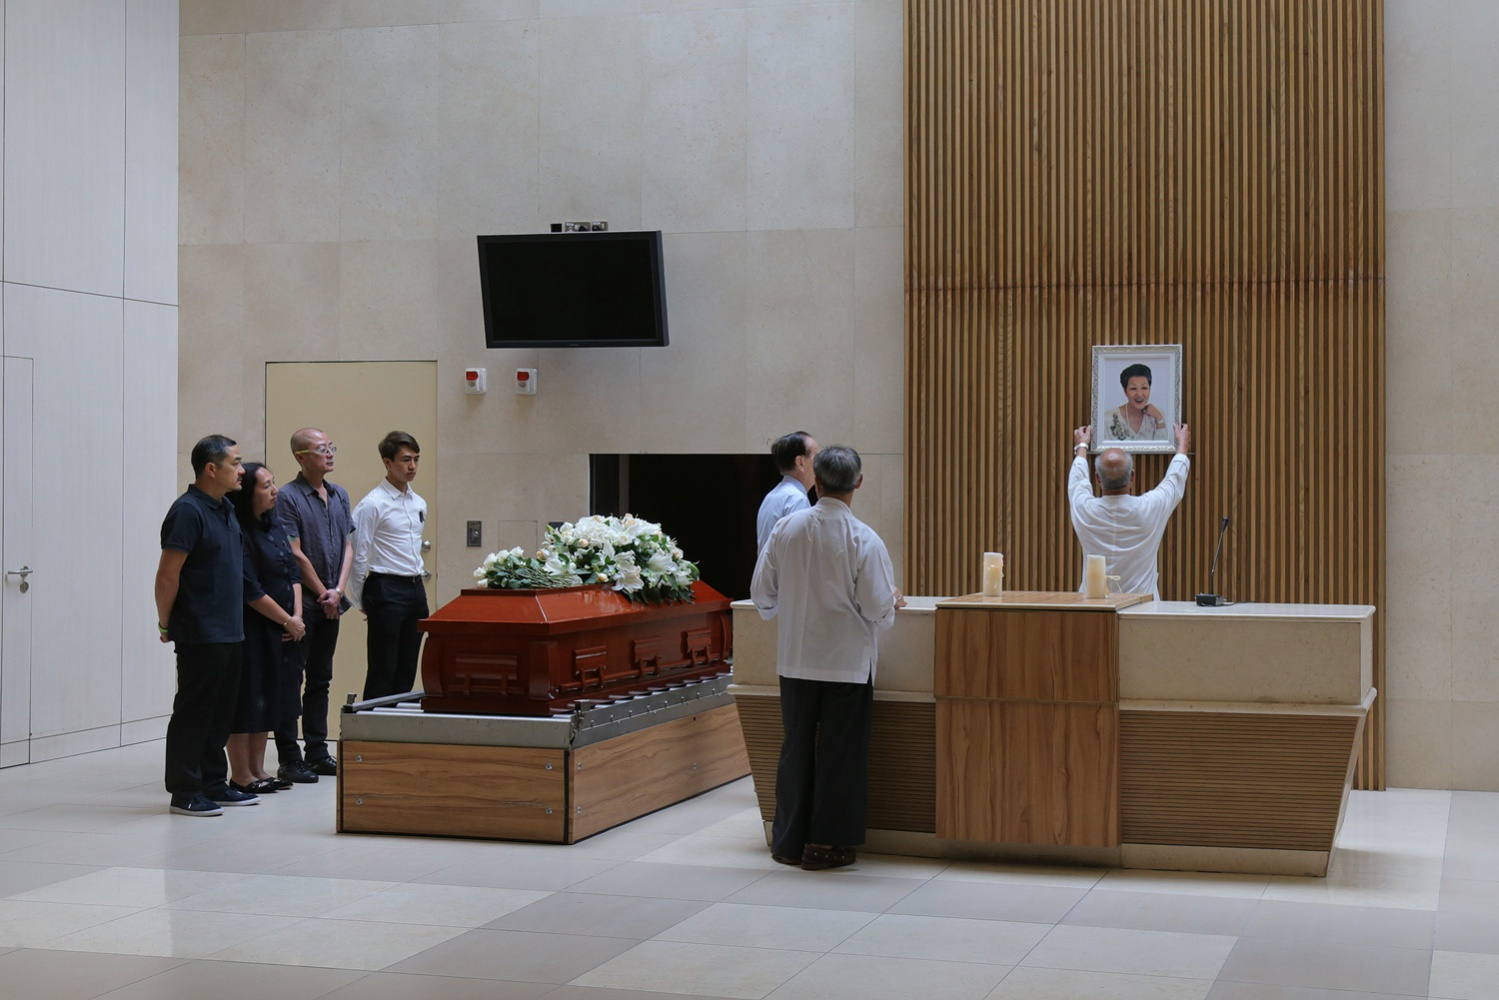 17-cremation Cremation Ceremony,  Hong Kong, 2017